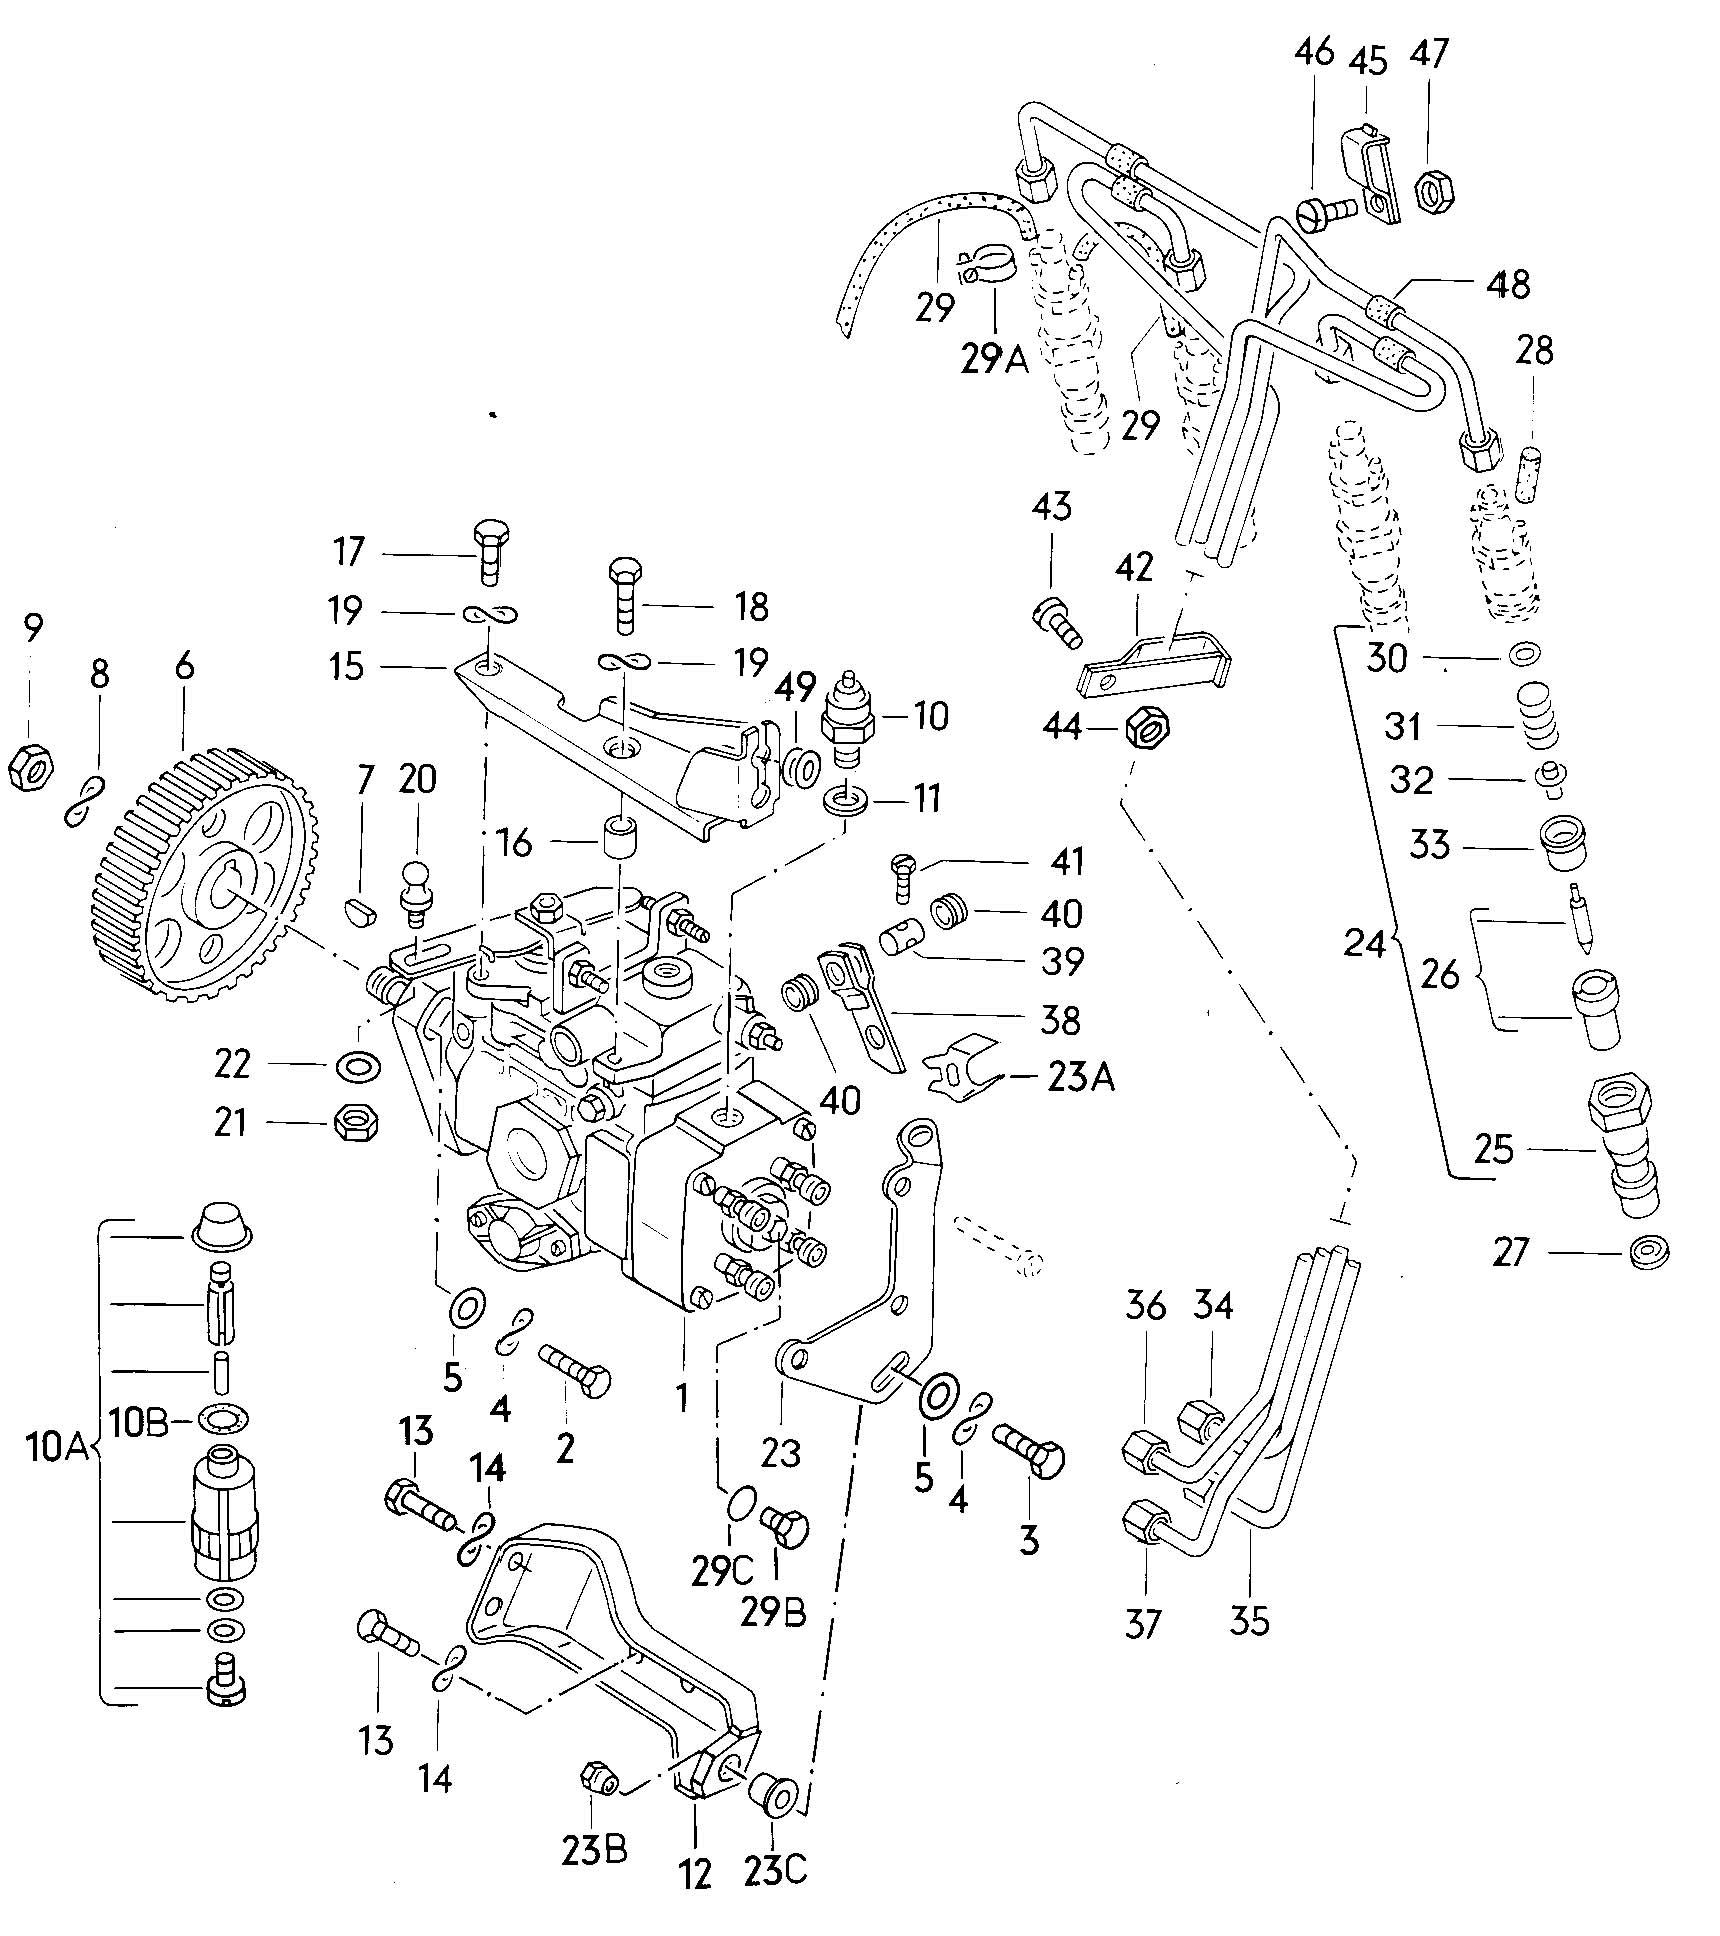 [DIAGRAM] Whirlpool Cabrio Wiring Diagram FULL Version HD